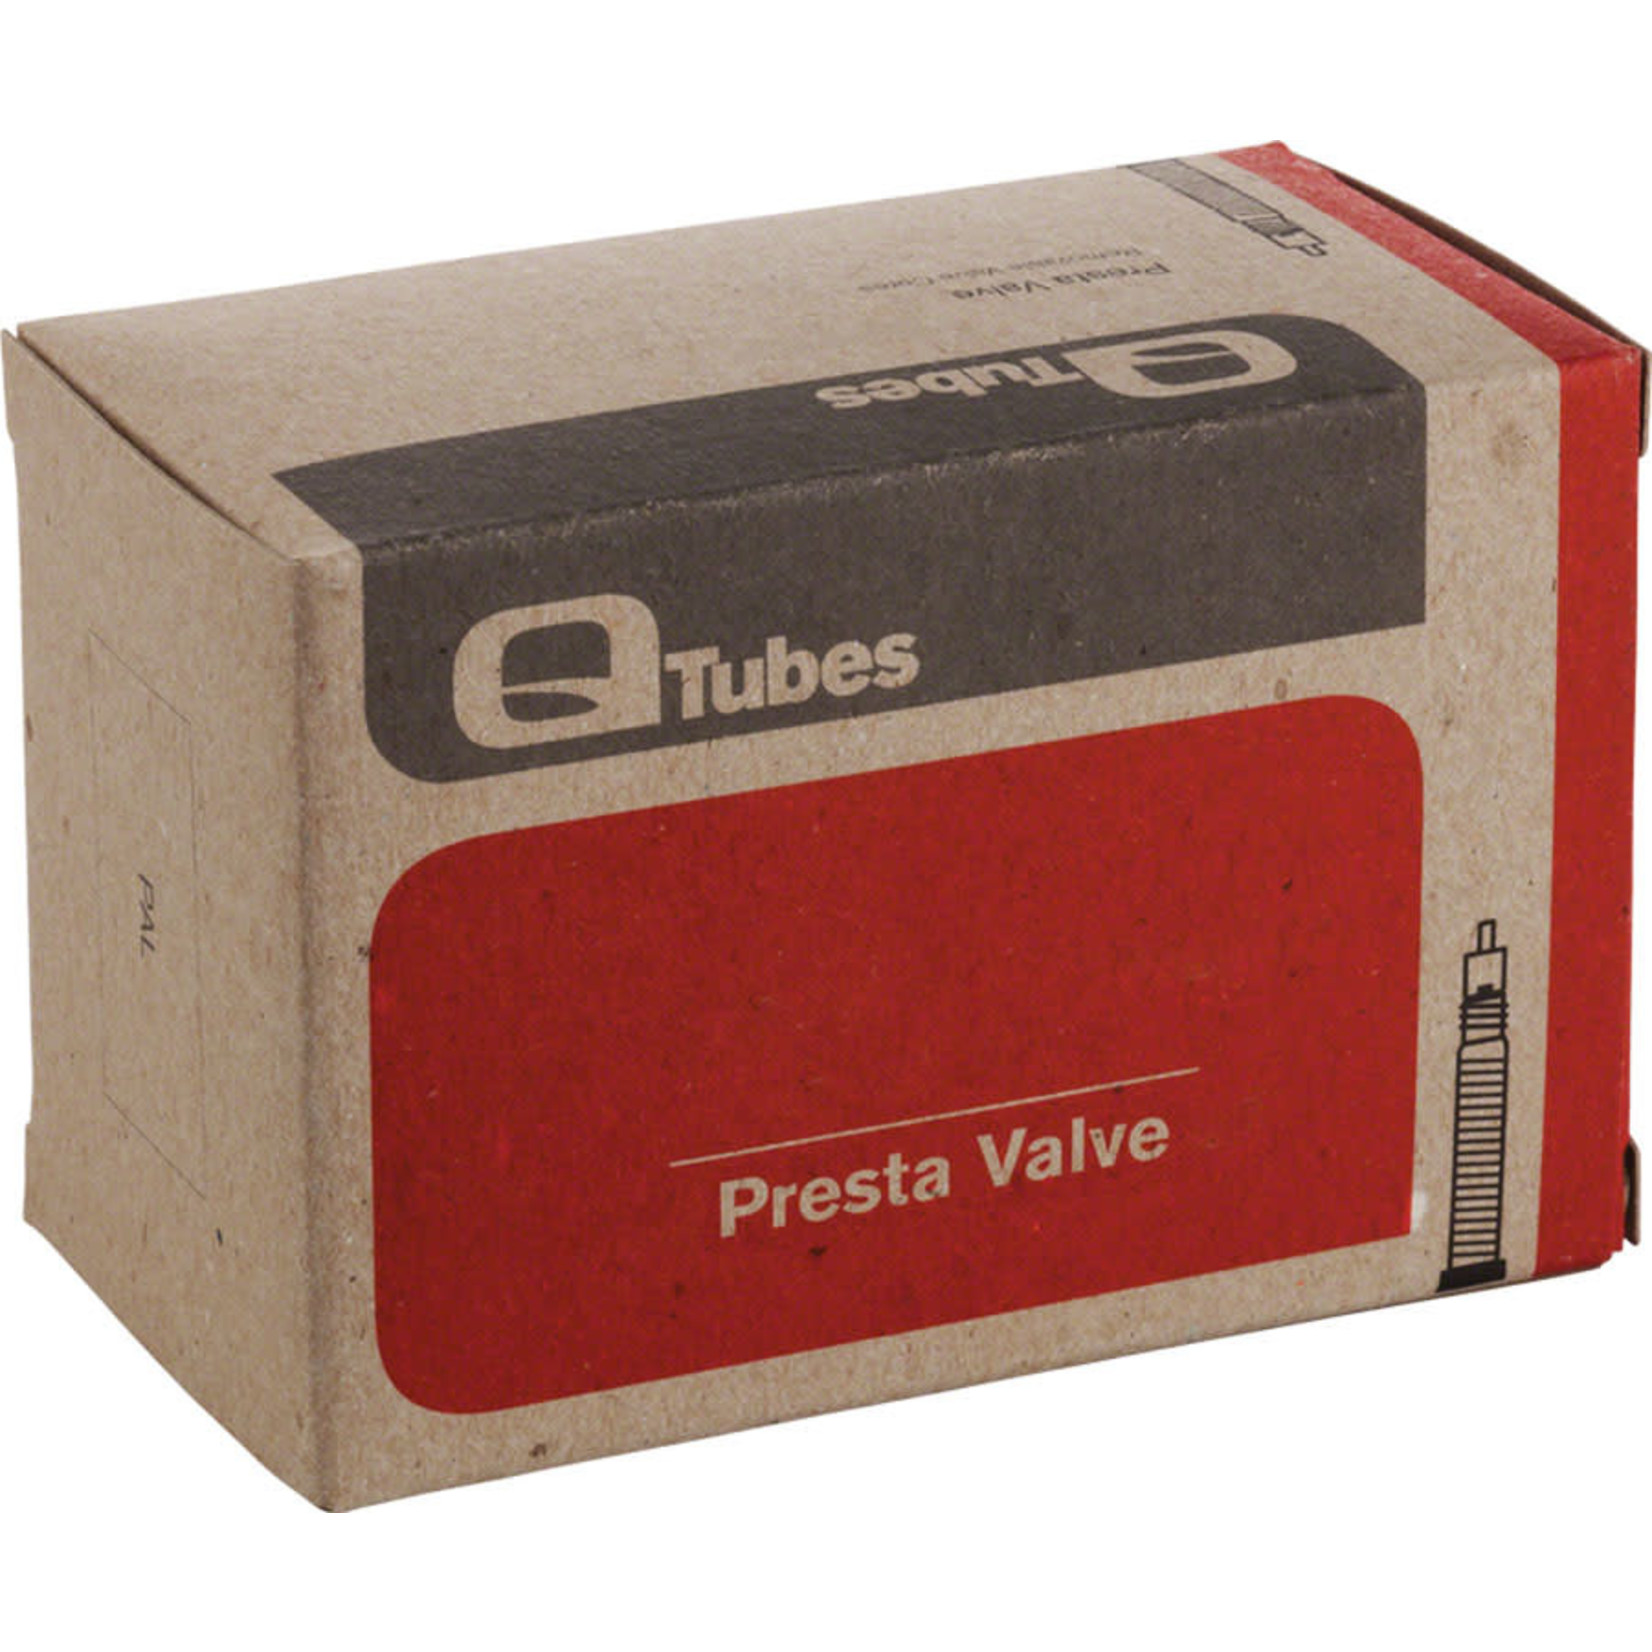 Q-Tubes Q-Tubes 700c x 23-25mm 32mm Presta Valve Tube 125g